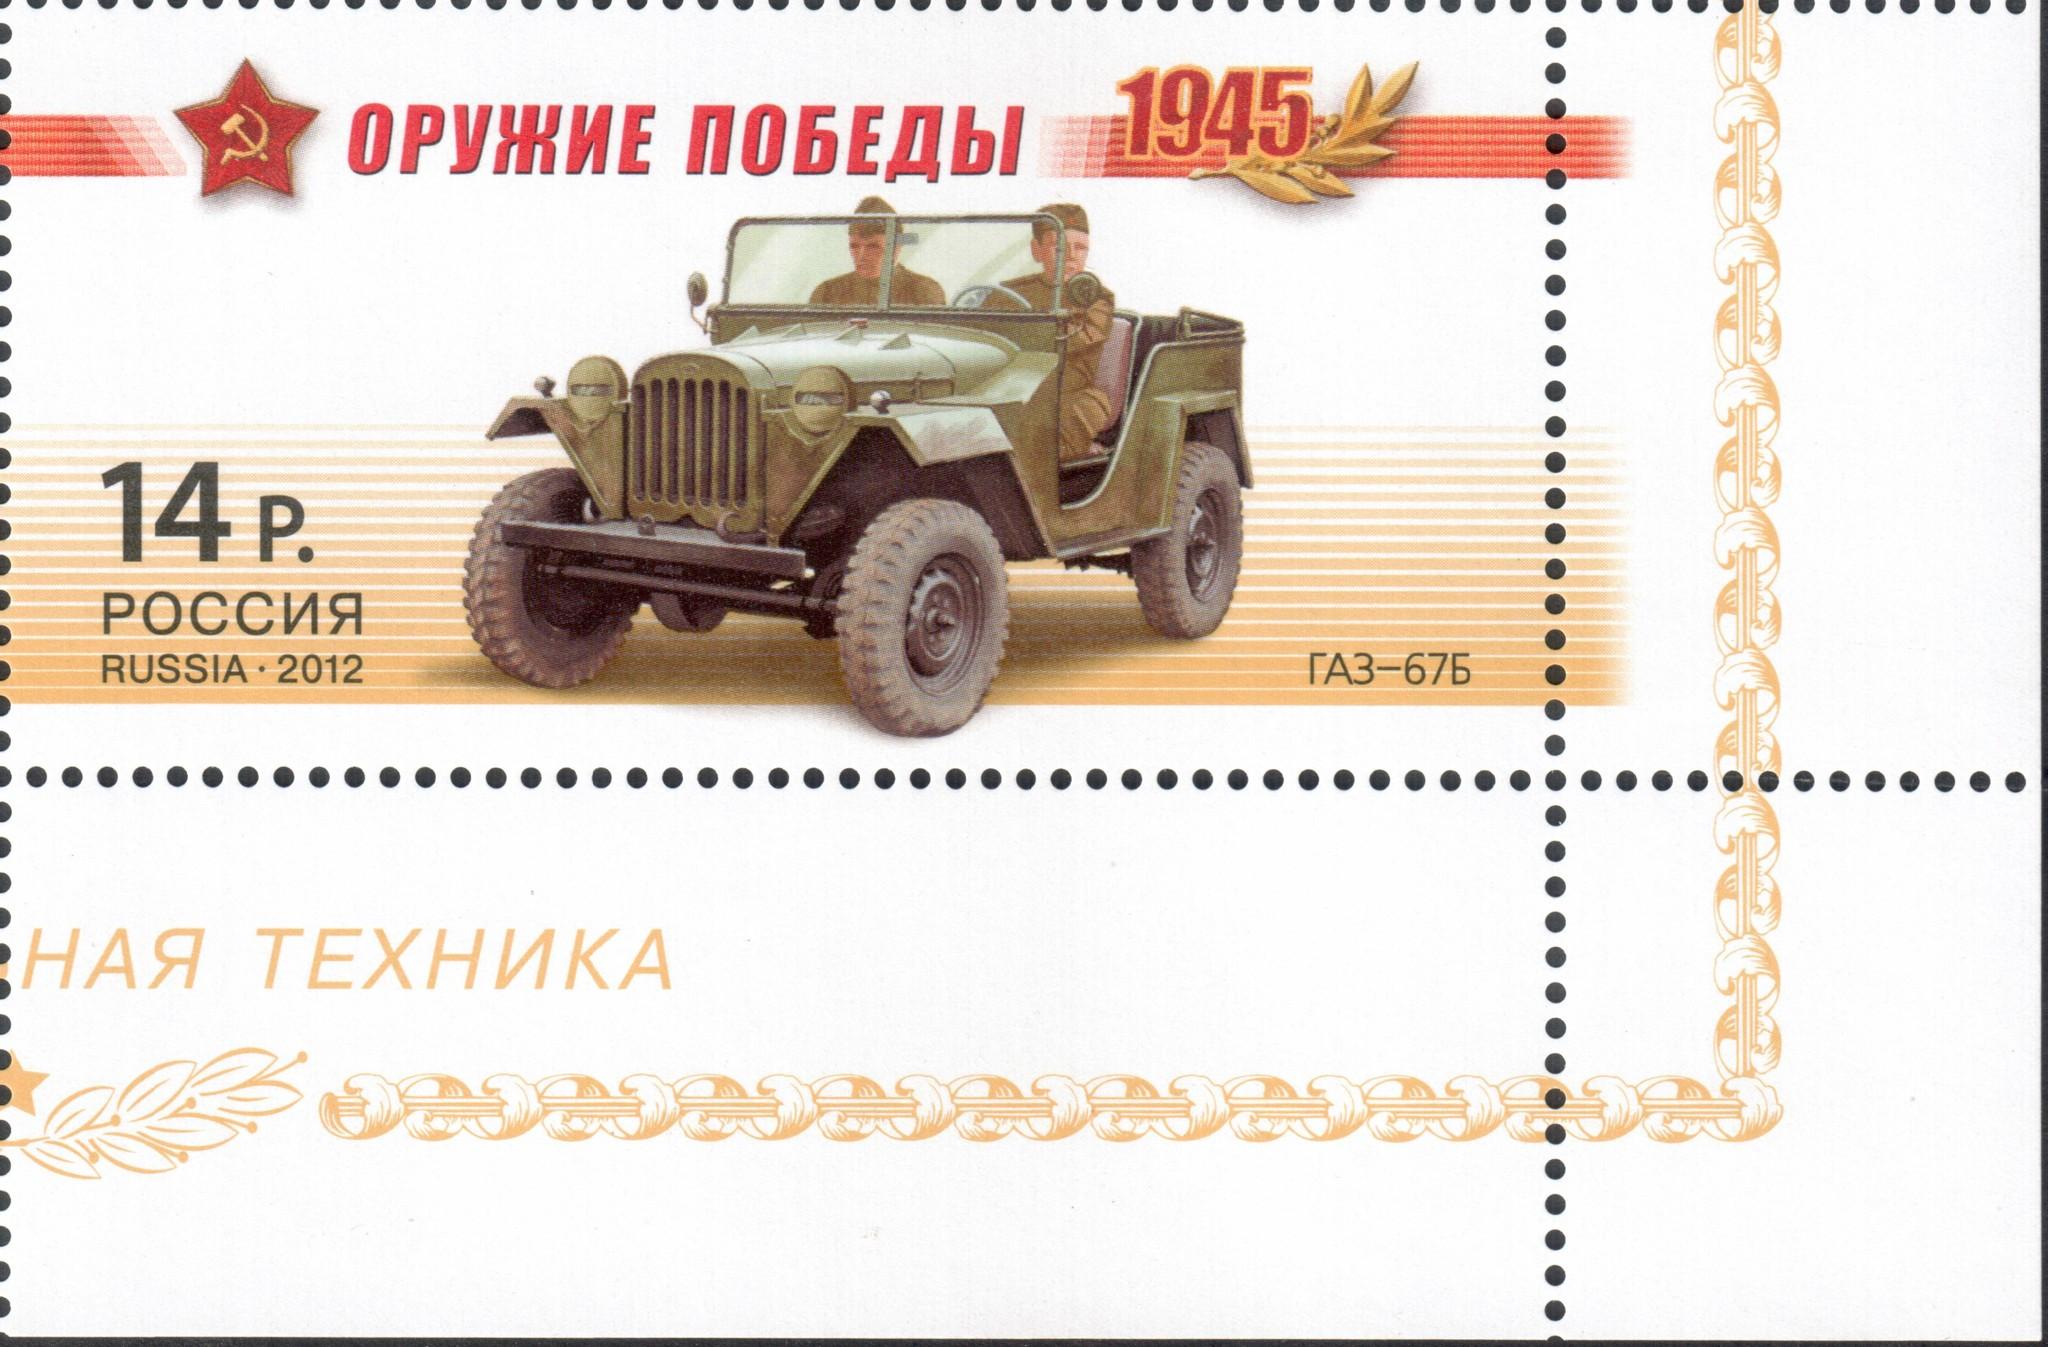 Автомобиль ГАЗ-67Б